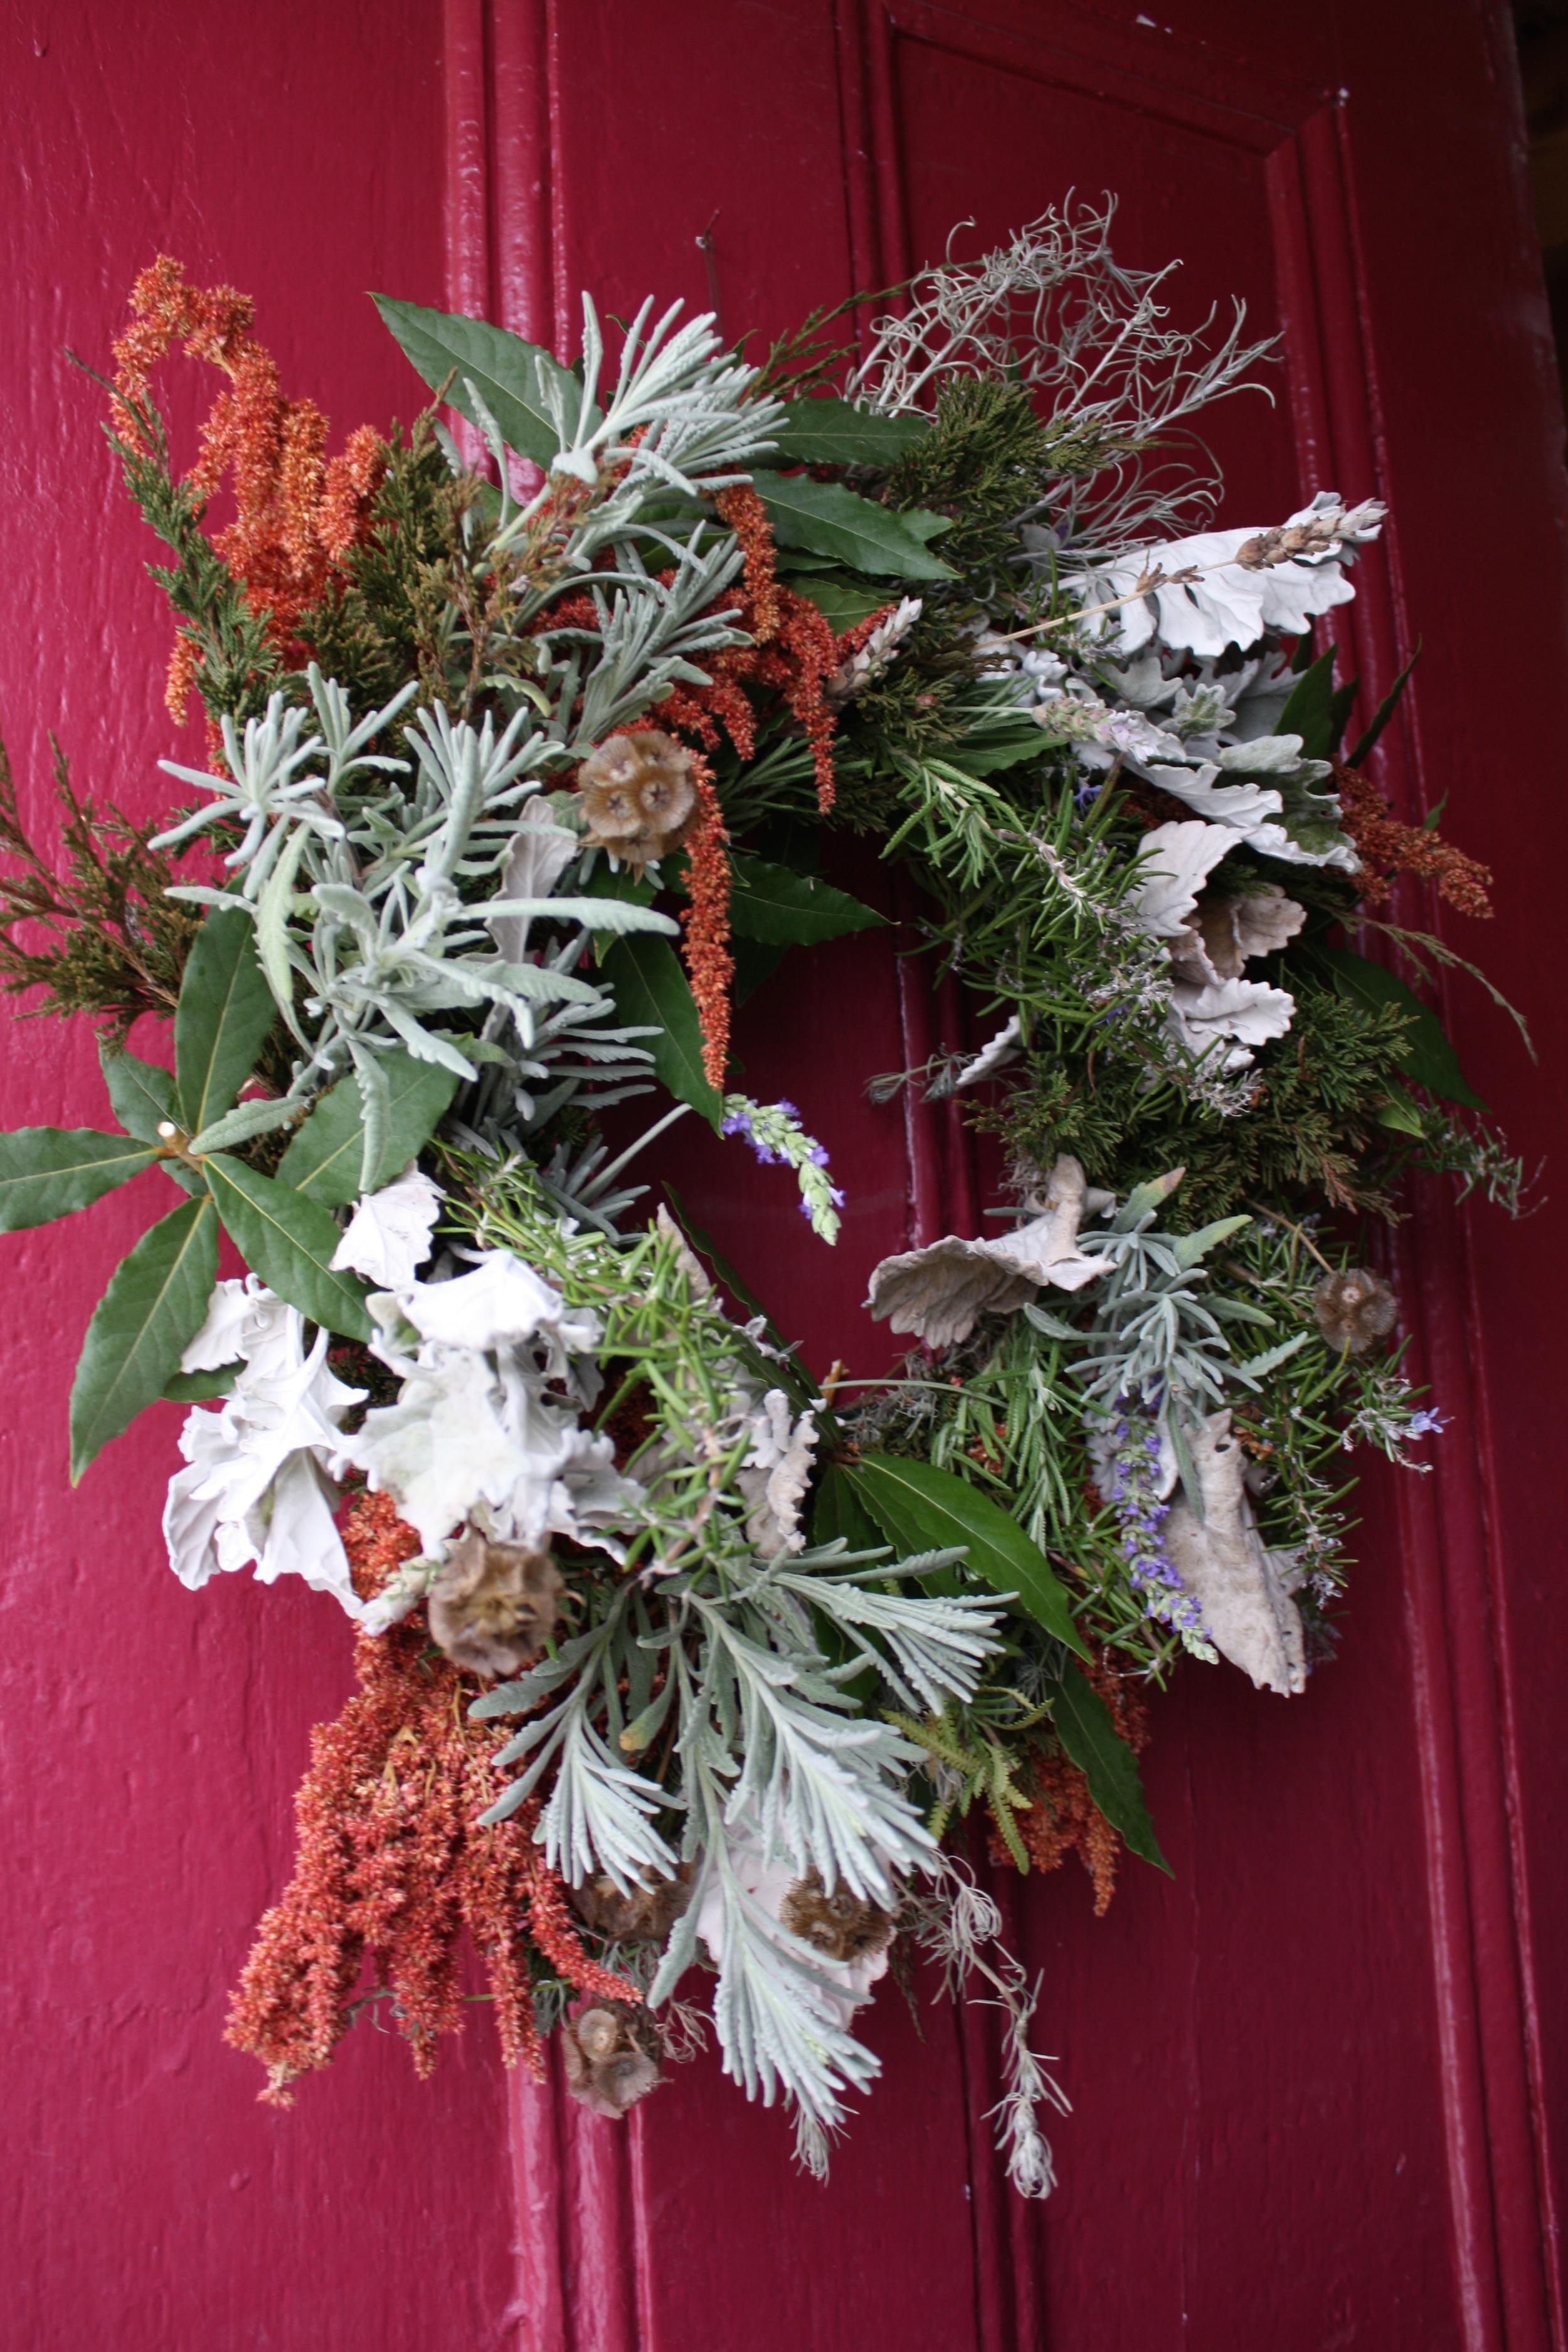 Bay Laurel, fresh lavender, prostrate rosemary, juniper, dried amaranth, dried dusty miller, dried ornamental curry, scabiosa pods